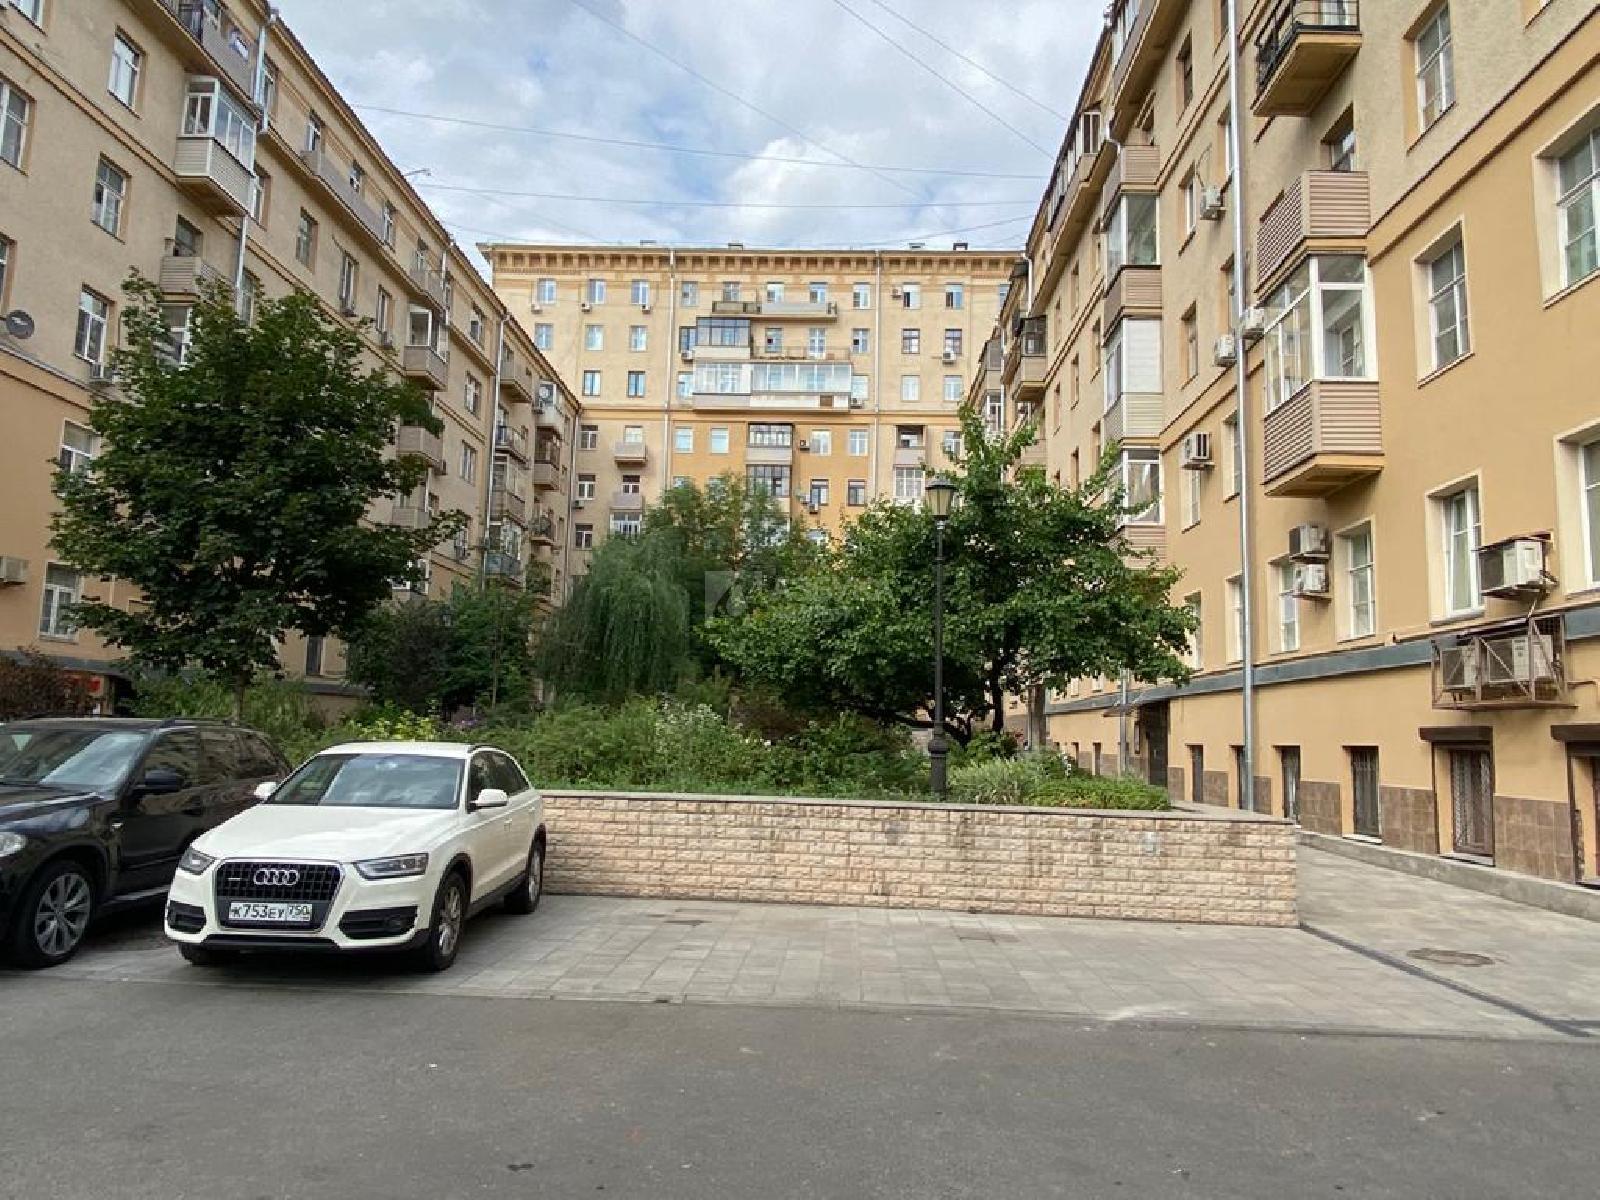 Фото №1 - 4-комнатная квартира, Москва, Ленинградский проспект 14 корпус 1, метро Белорусская